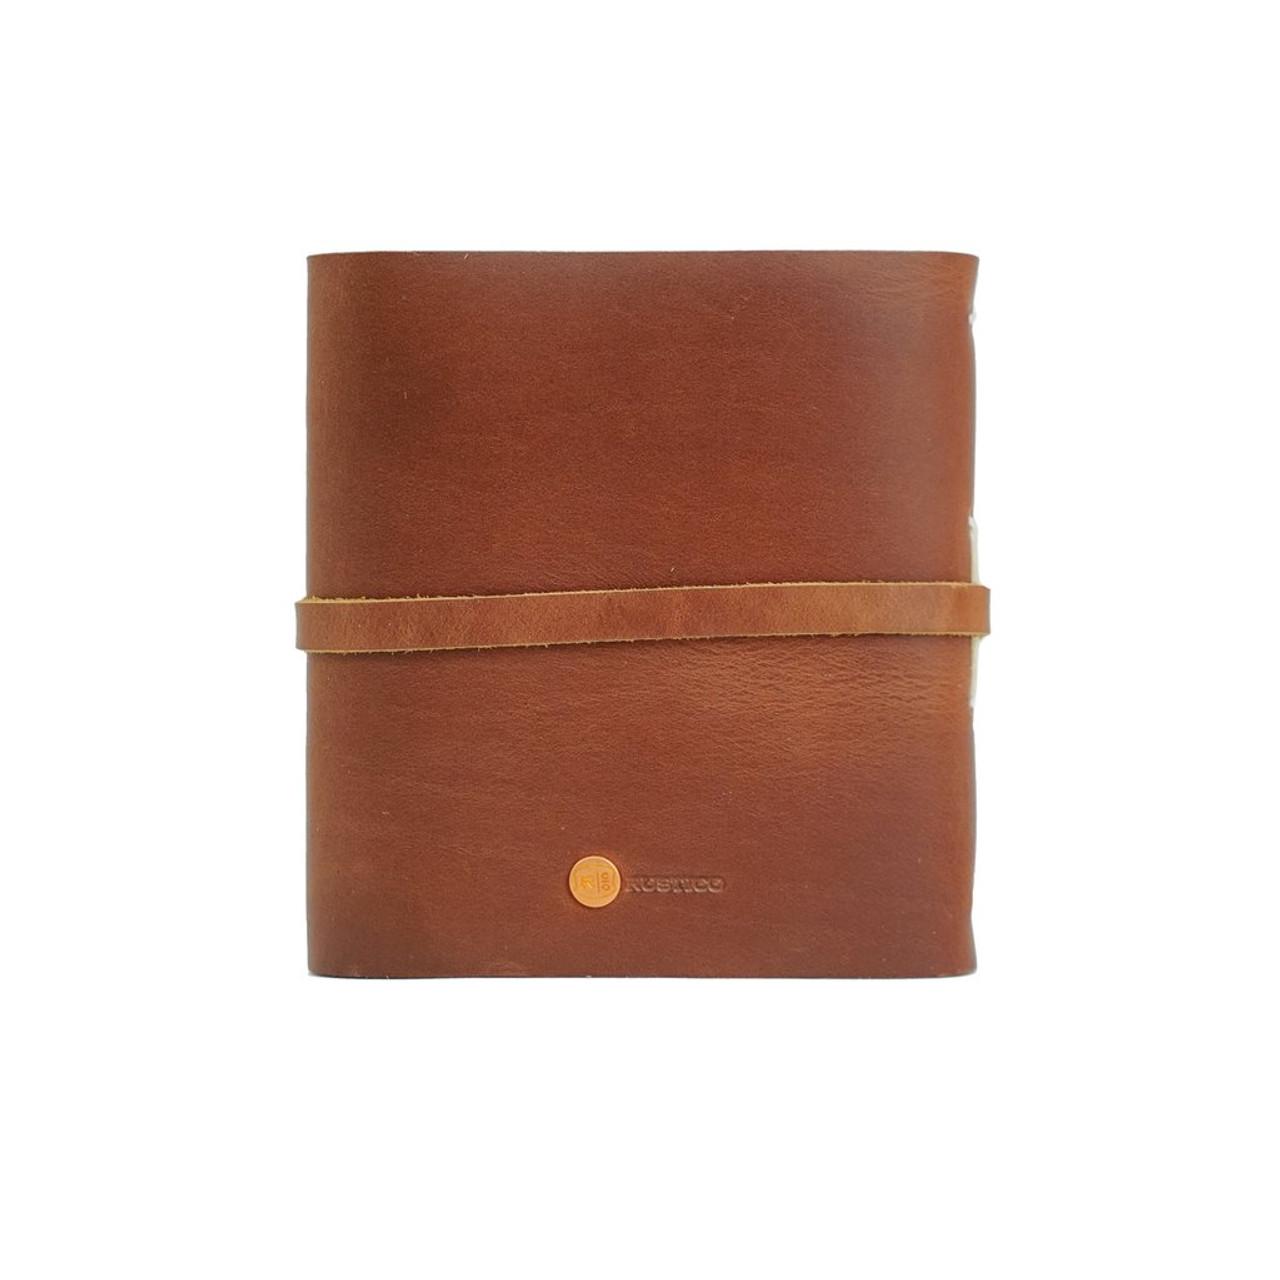 "Rustico Leather Photo Album - Rear View - 4"" x 4"""